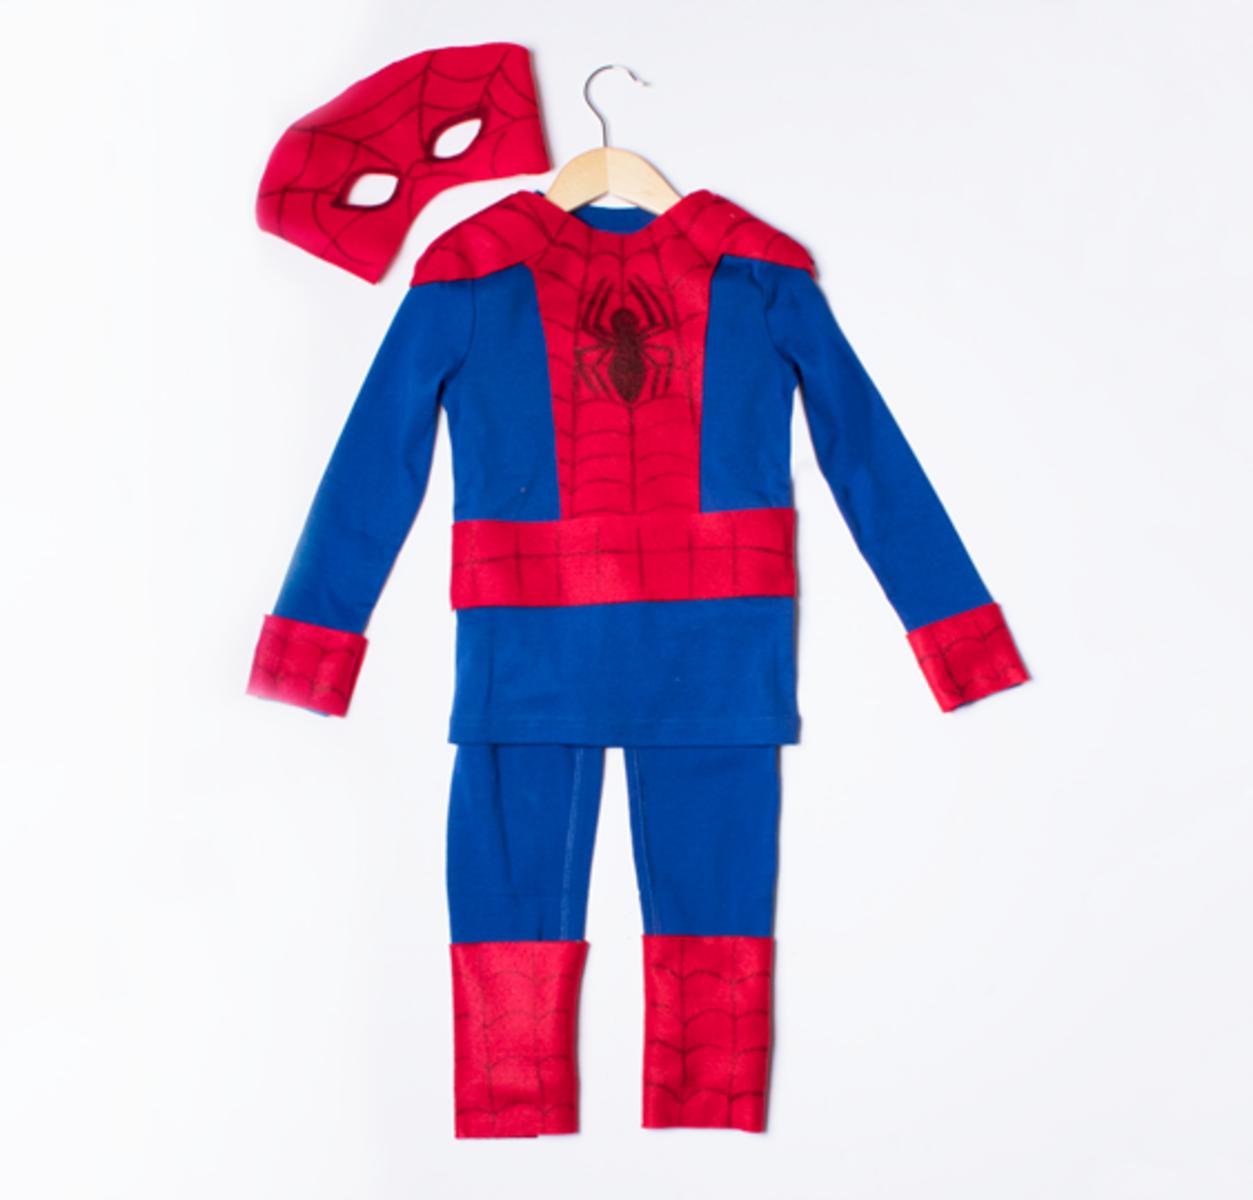 Easy simple diy homemade spiderman costume idea for kids no sew easy simple diy homemade spiderman costume idea for kids no sew jeuxipadfo Images